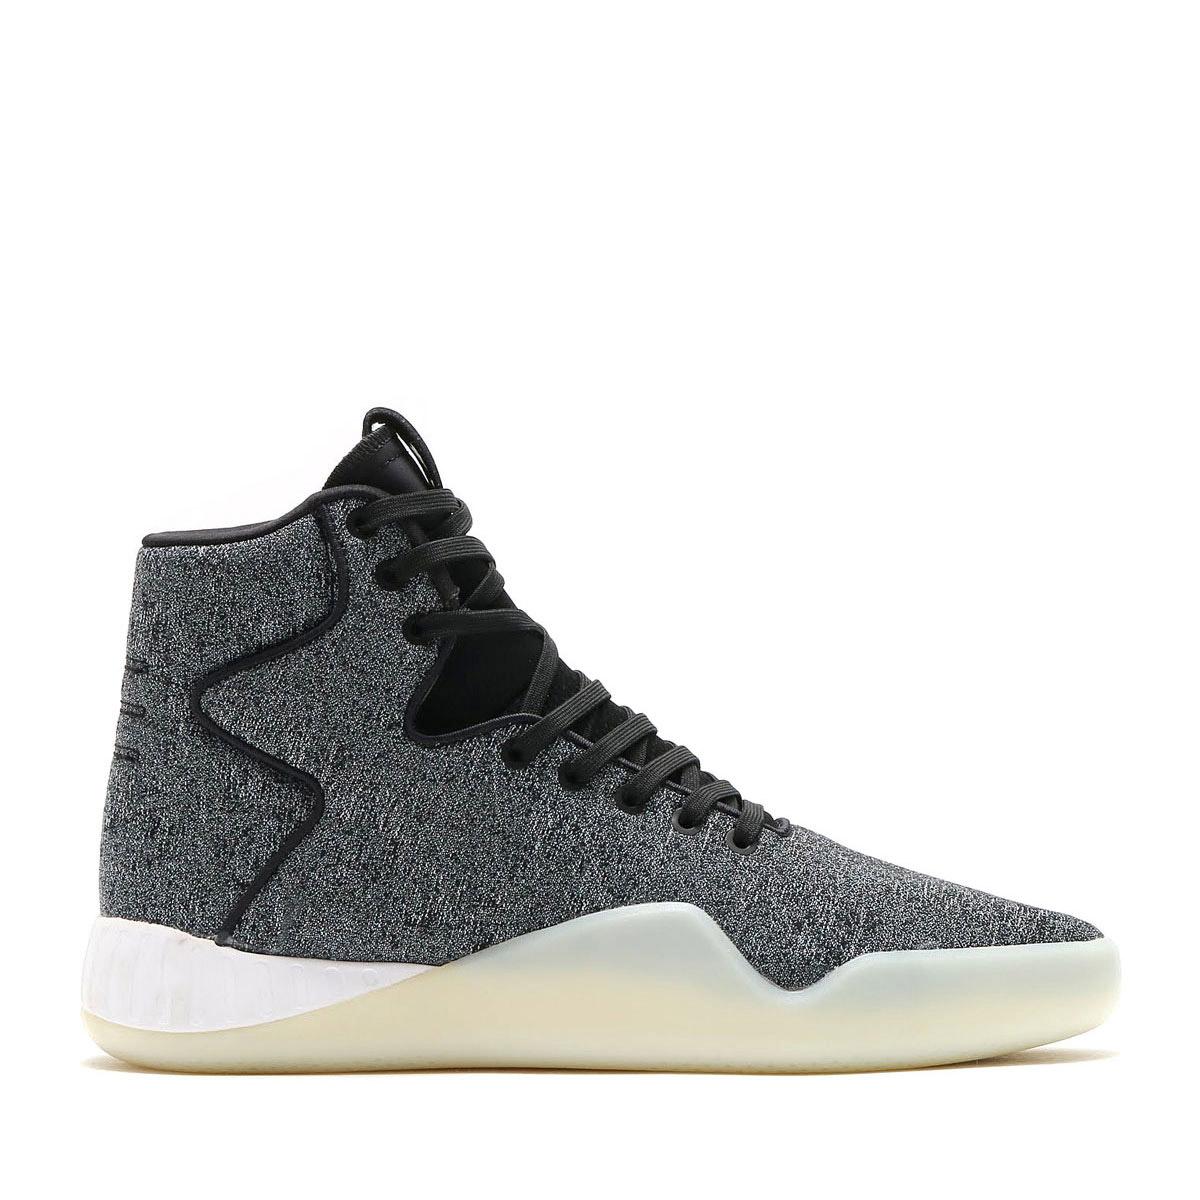 adidas Originals TUBULAR ISTNT JC(adidasuorijinarusuchuburainsutinkuto JC)(Core Black/Crystal White/Running White)17SS-I